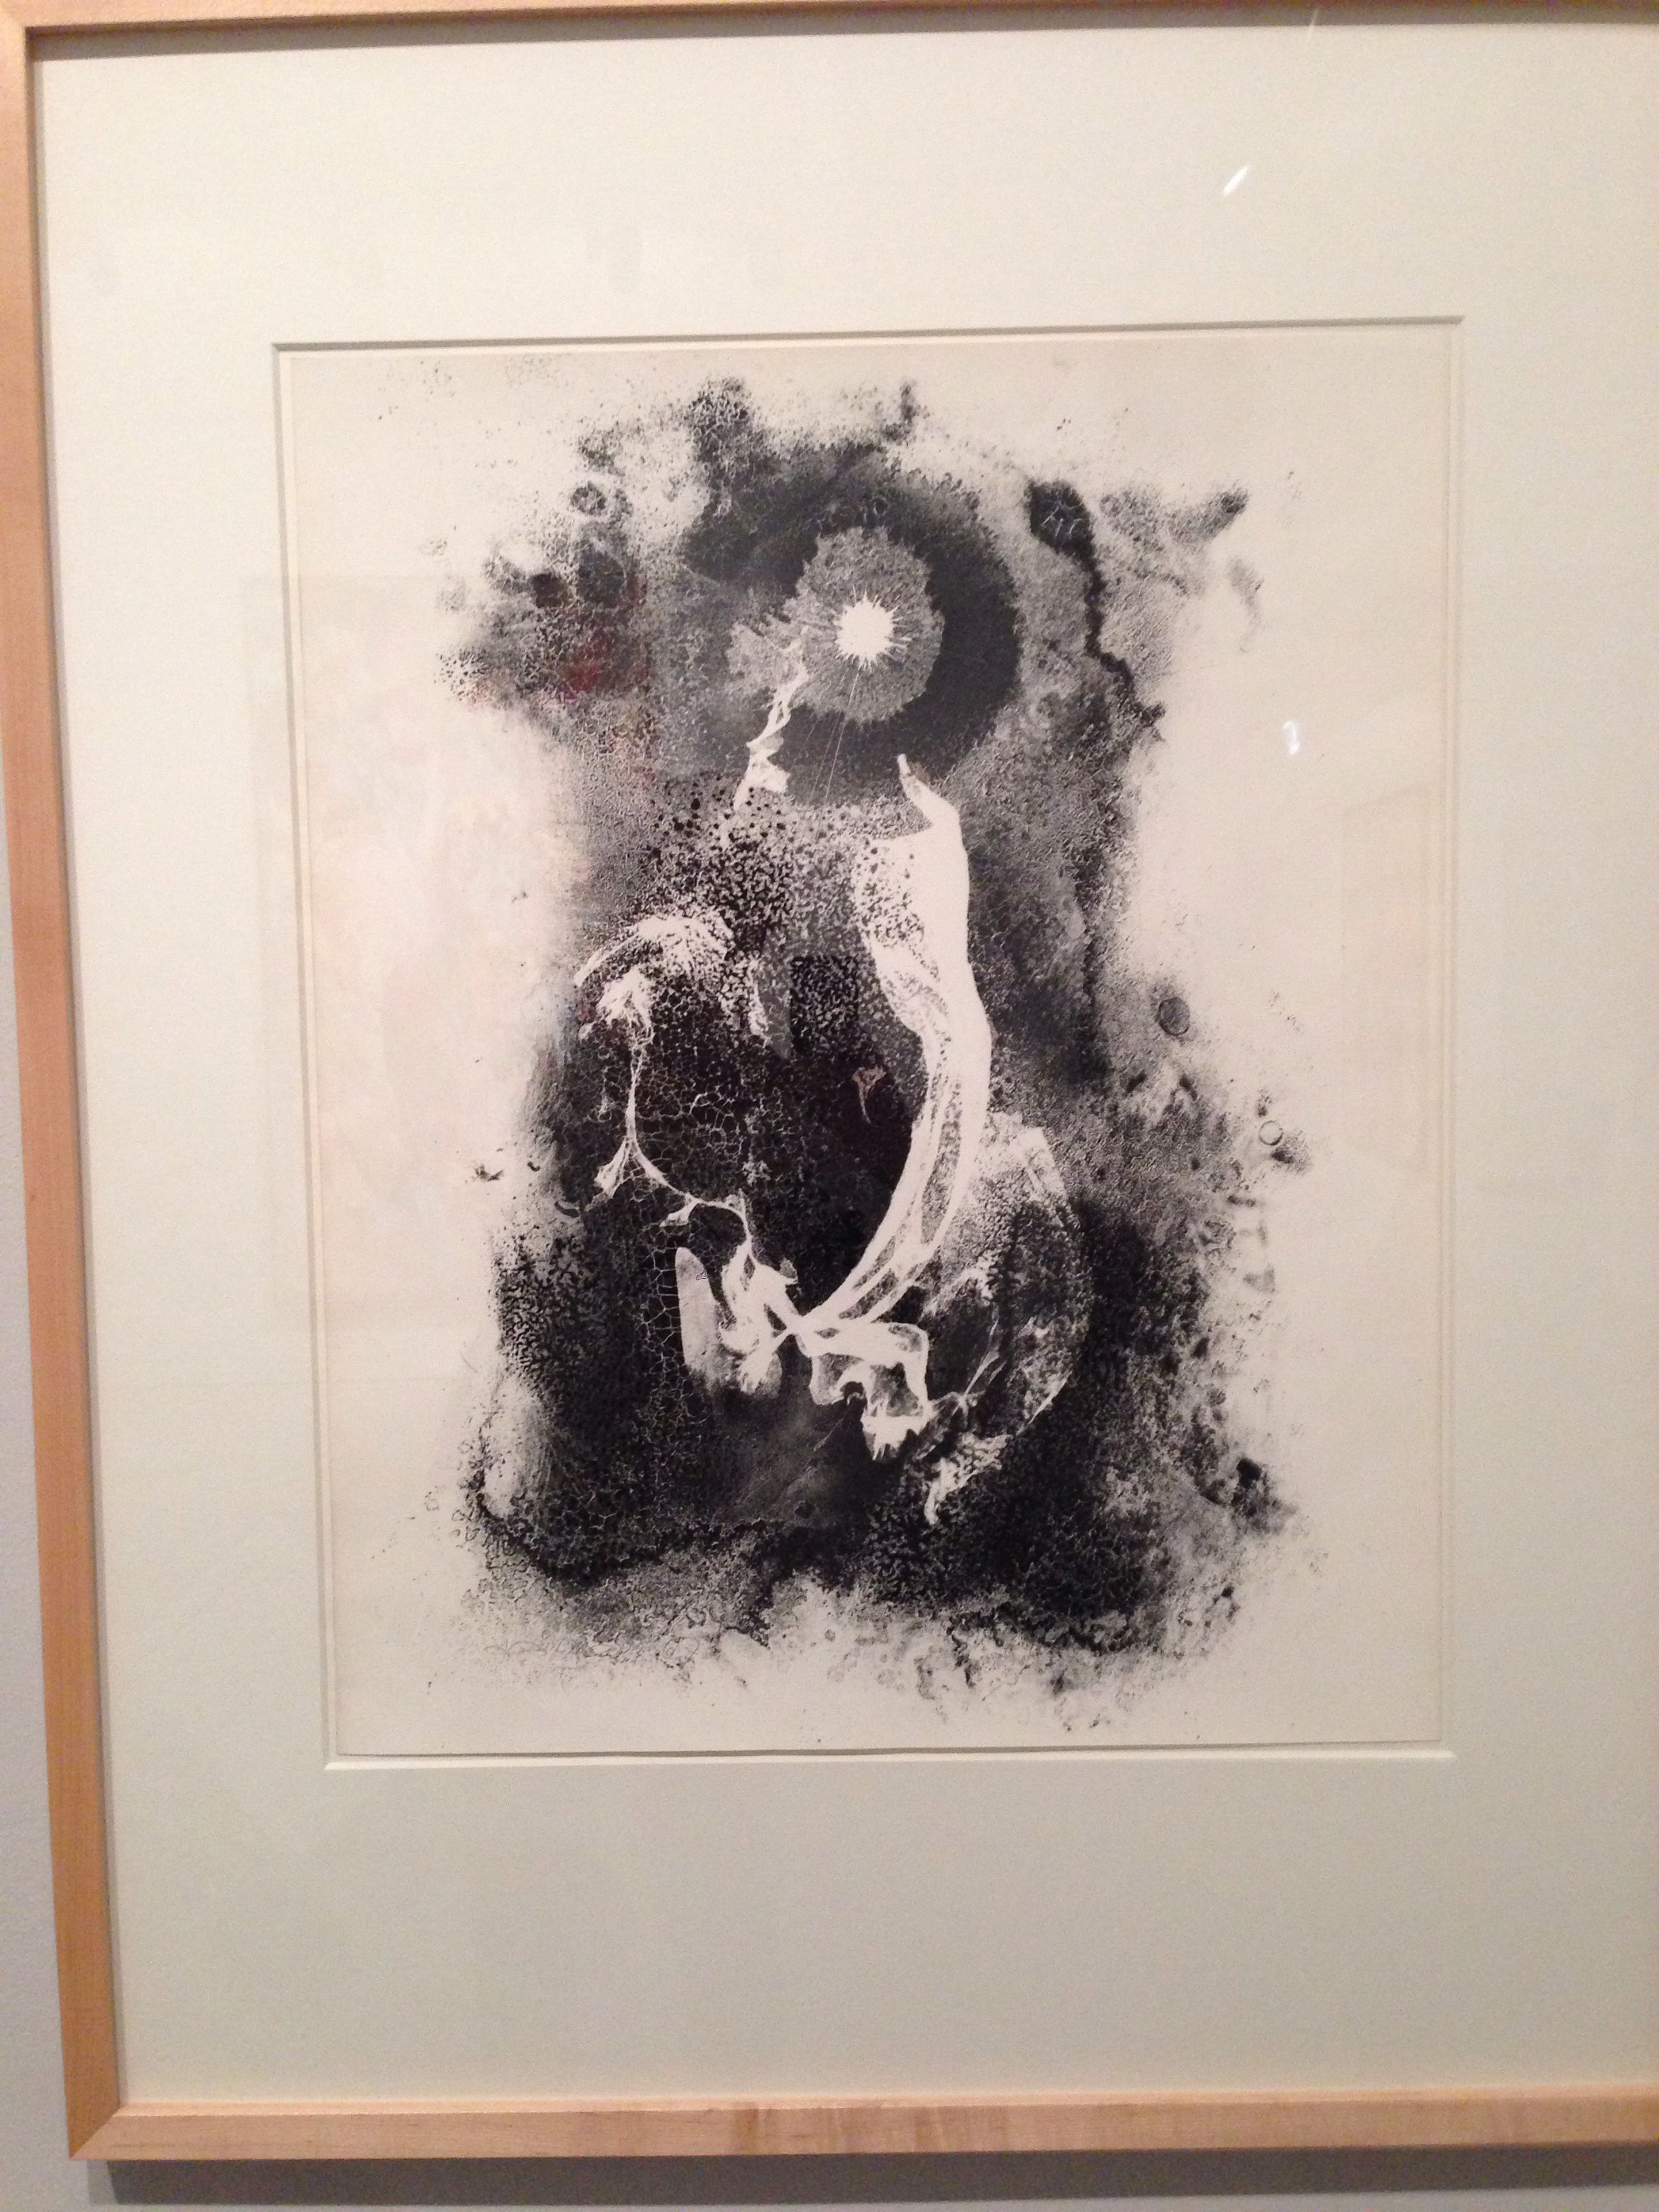 Heinz Hajek-Halke art